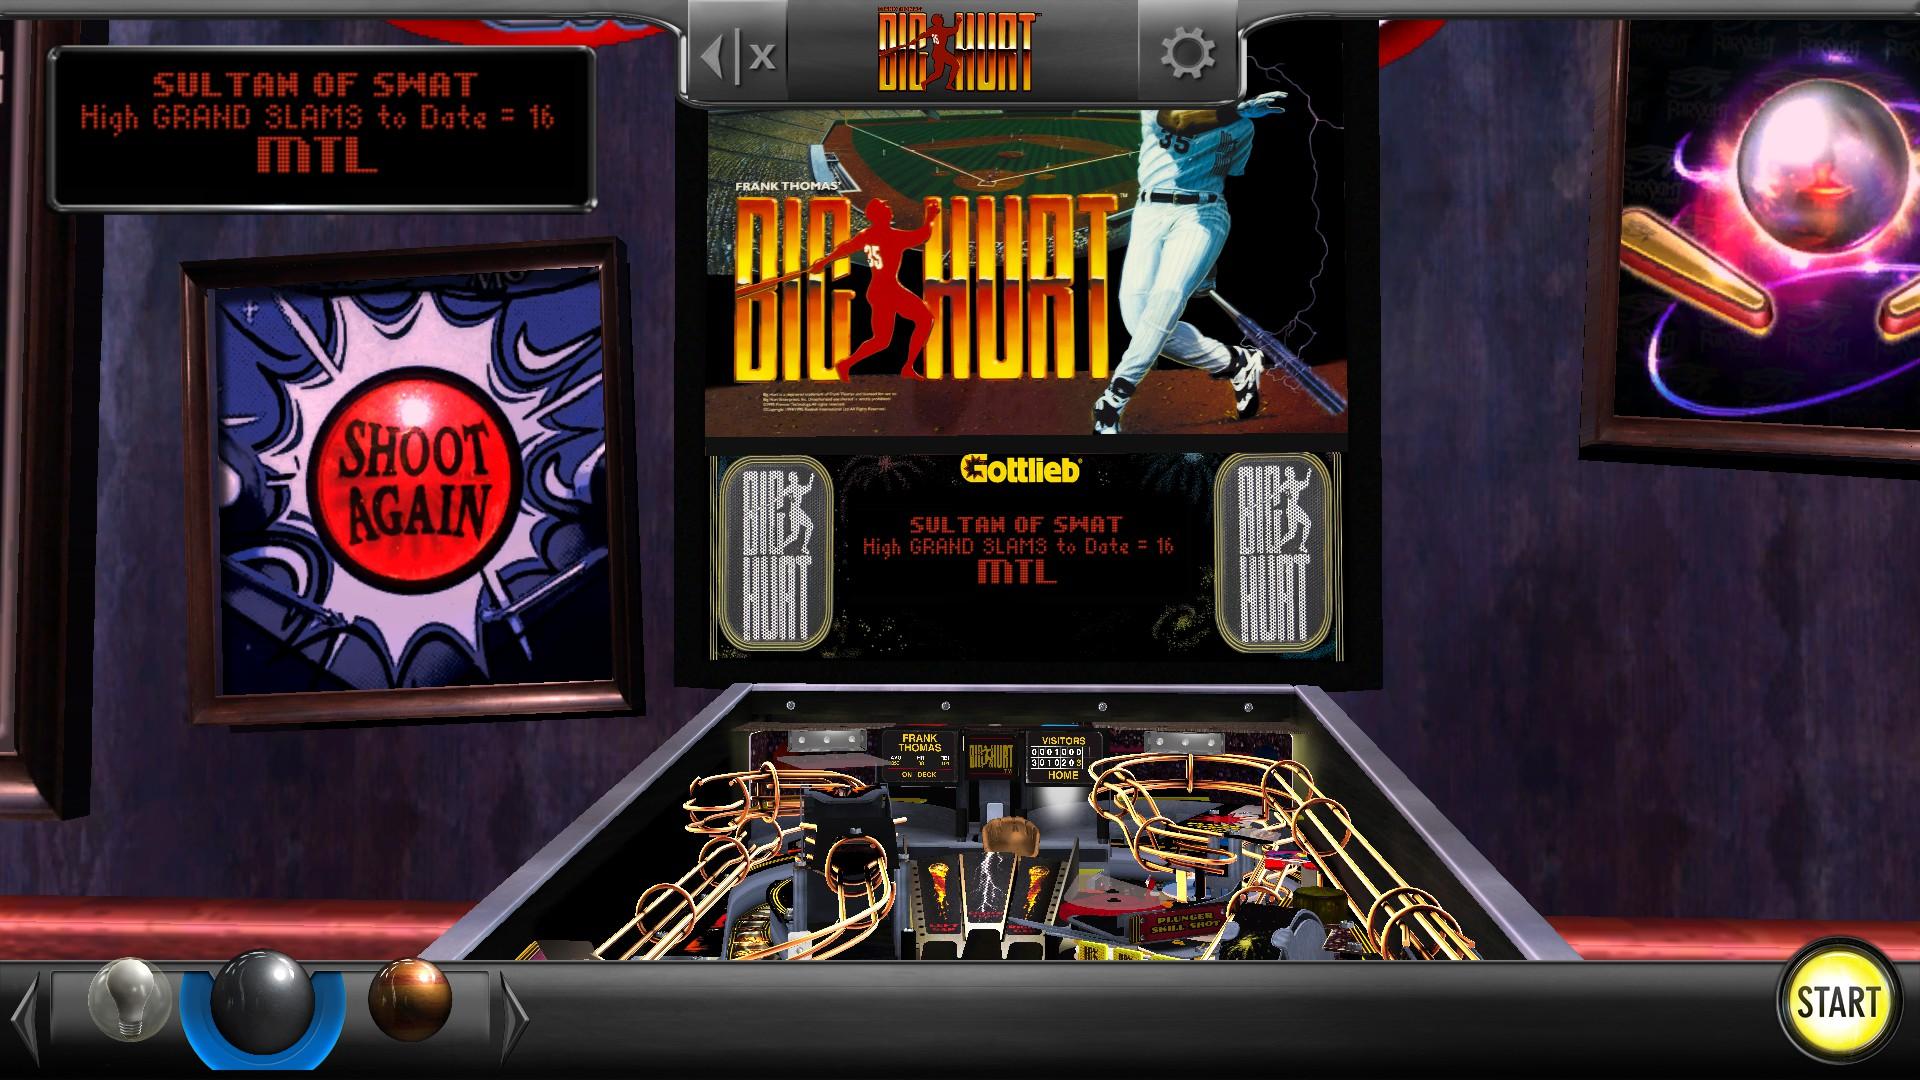 Mantalow: Pinball Arcade: Big Hurt (PC) 1,515,745,850 points on 2016-08-25 02:13:38